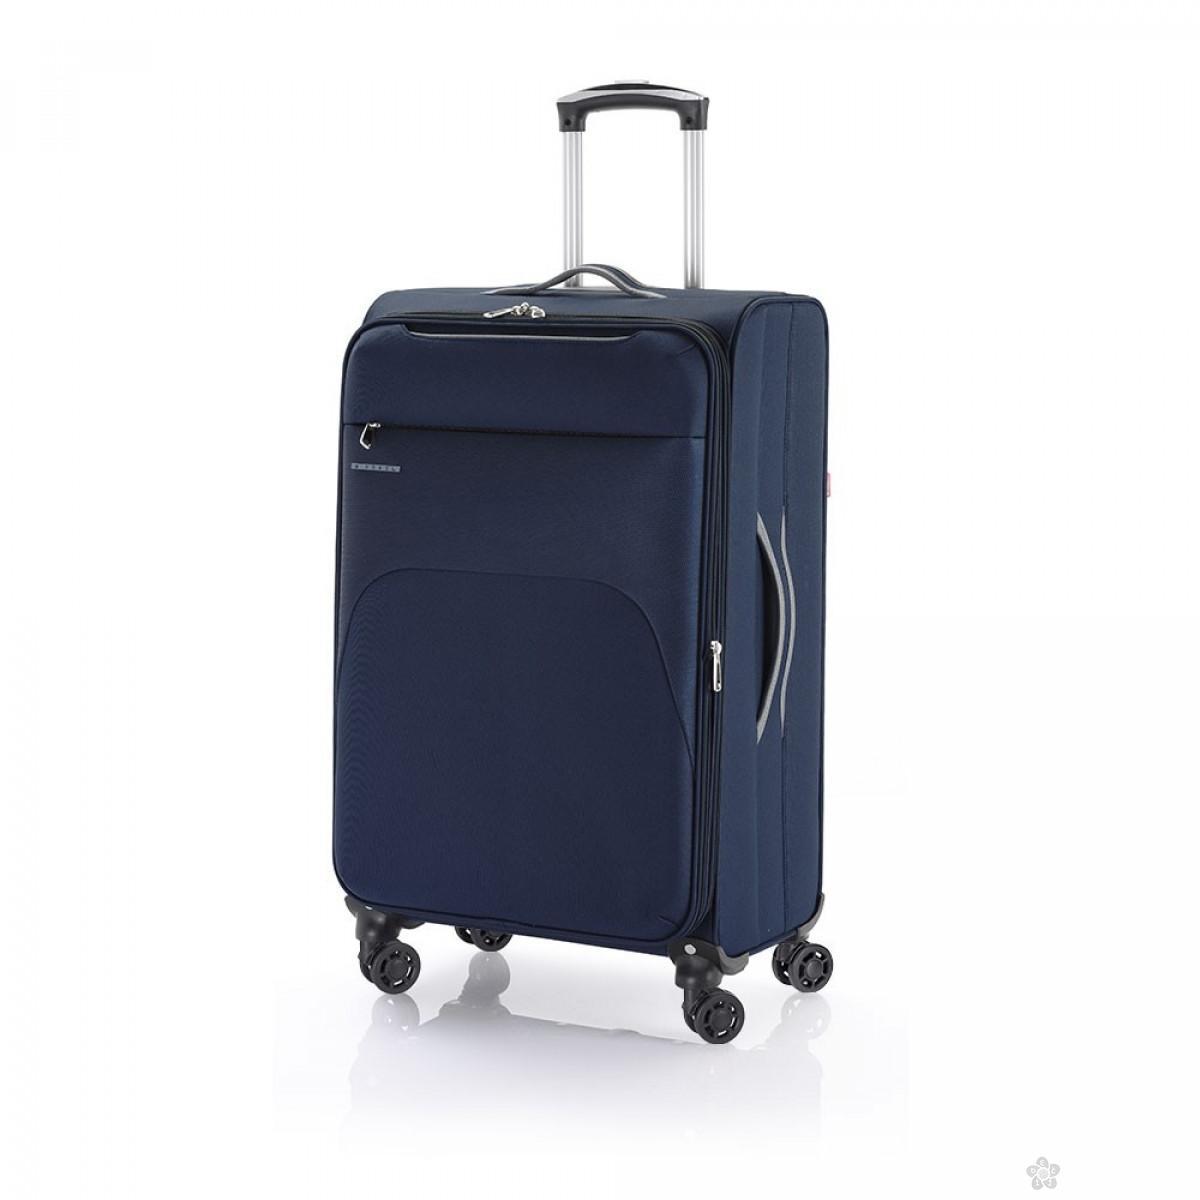 Kofer srednji polyester Zambia plava, 16KG113446E